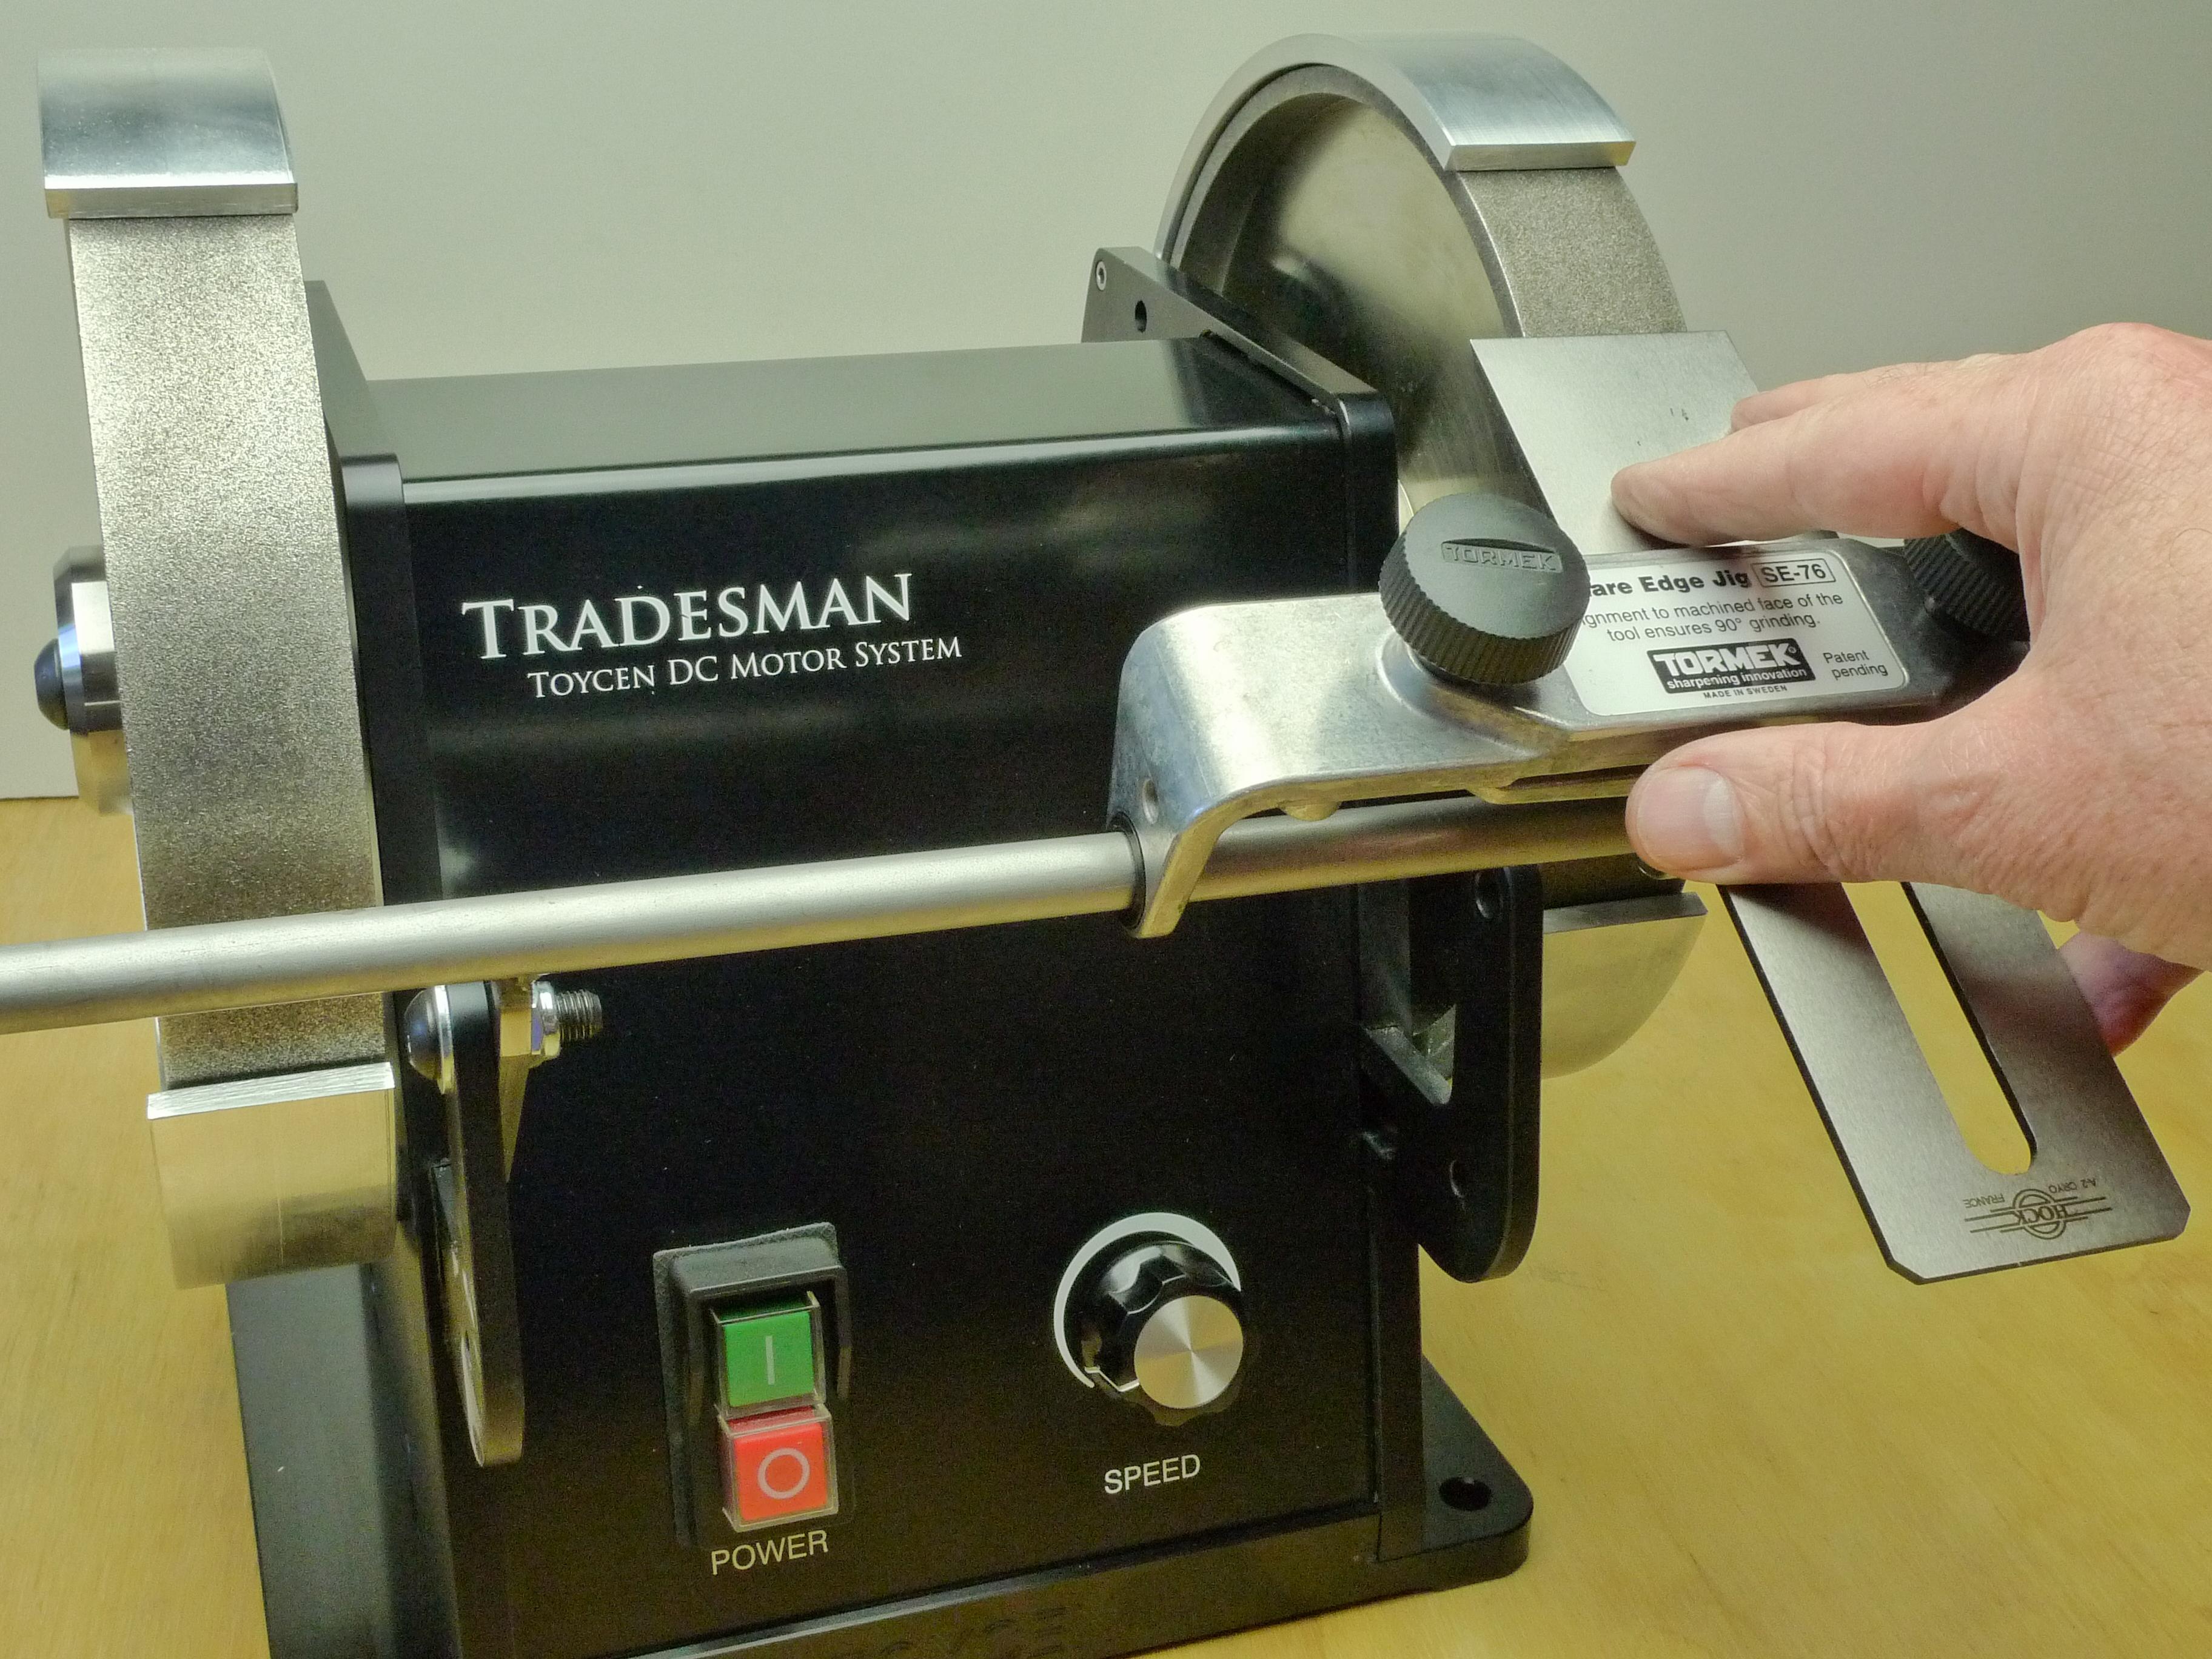 Groovy Toycen Tradesman Grinder The Sharpening Blog Camellatalisay Diy Chair Ideas Camellatalisaycom